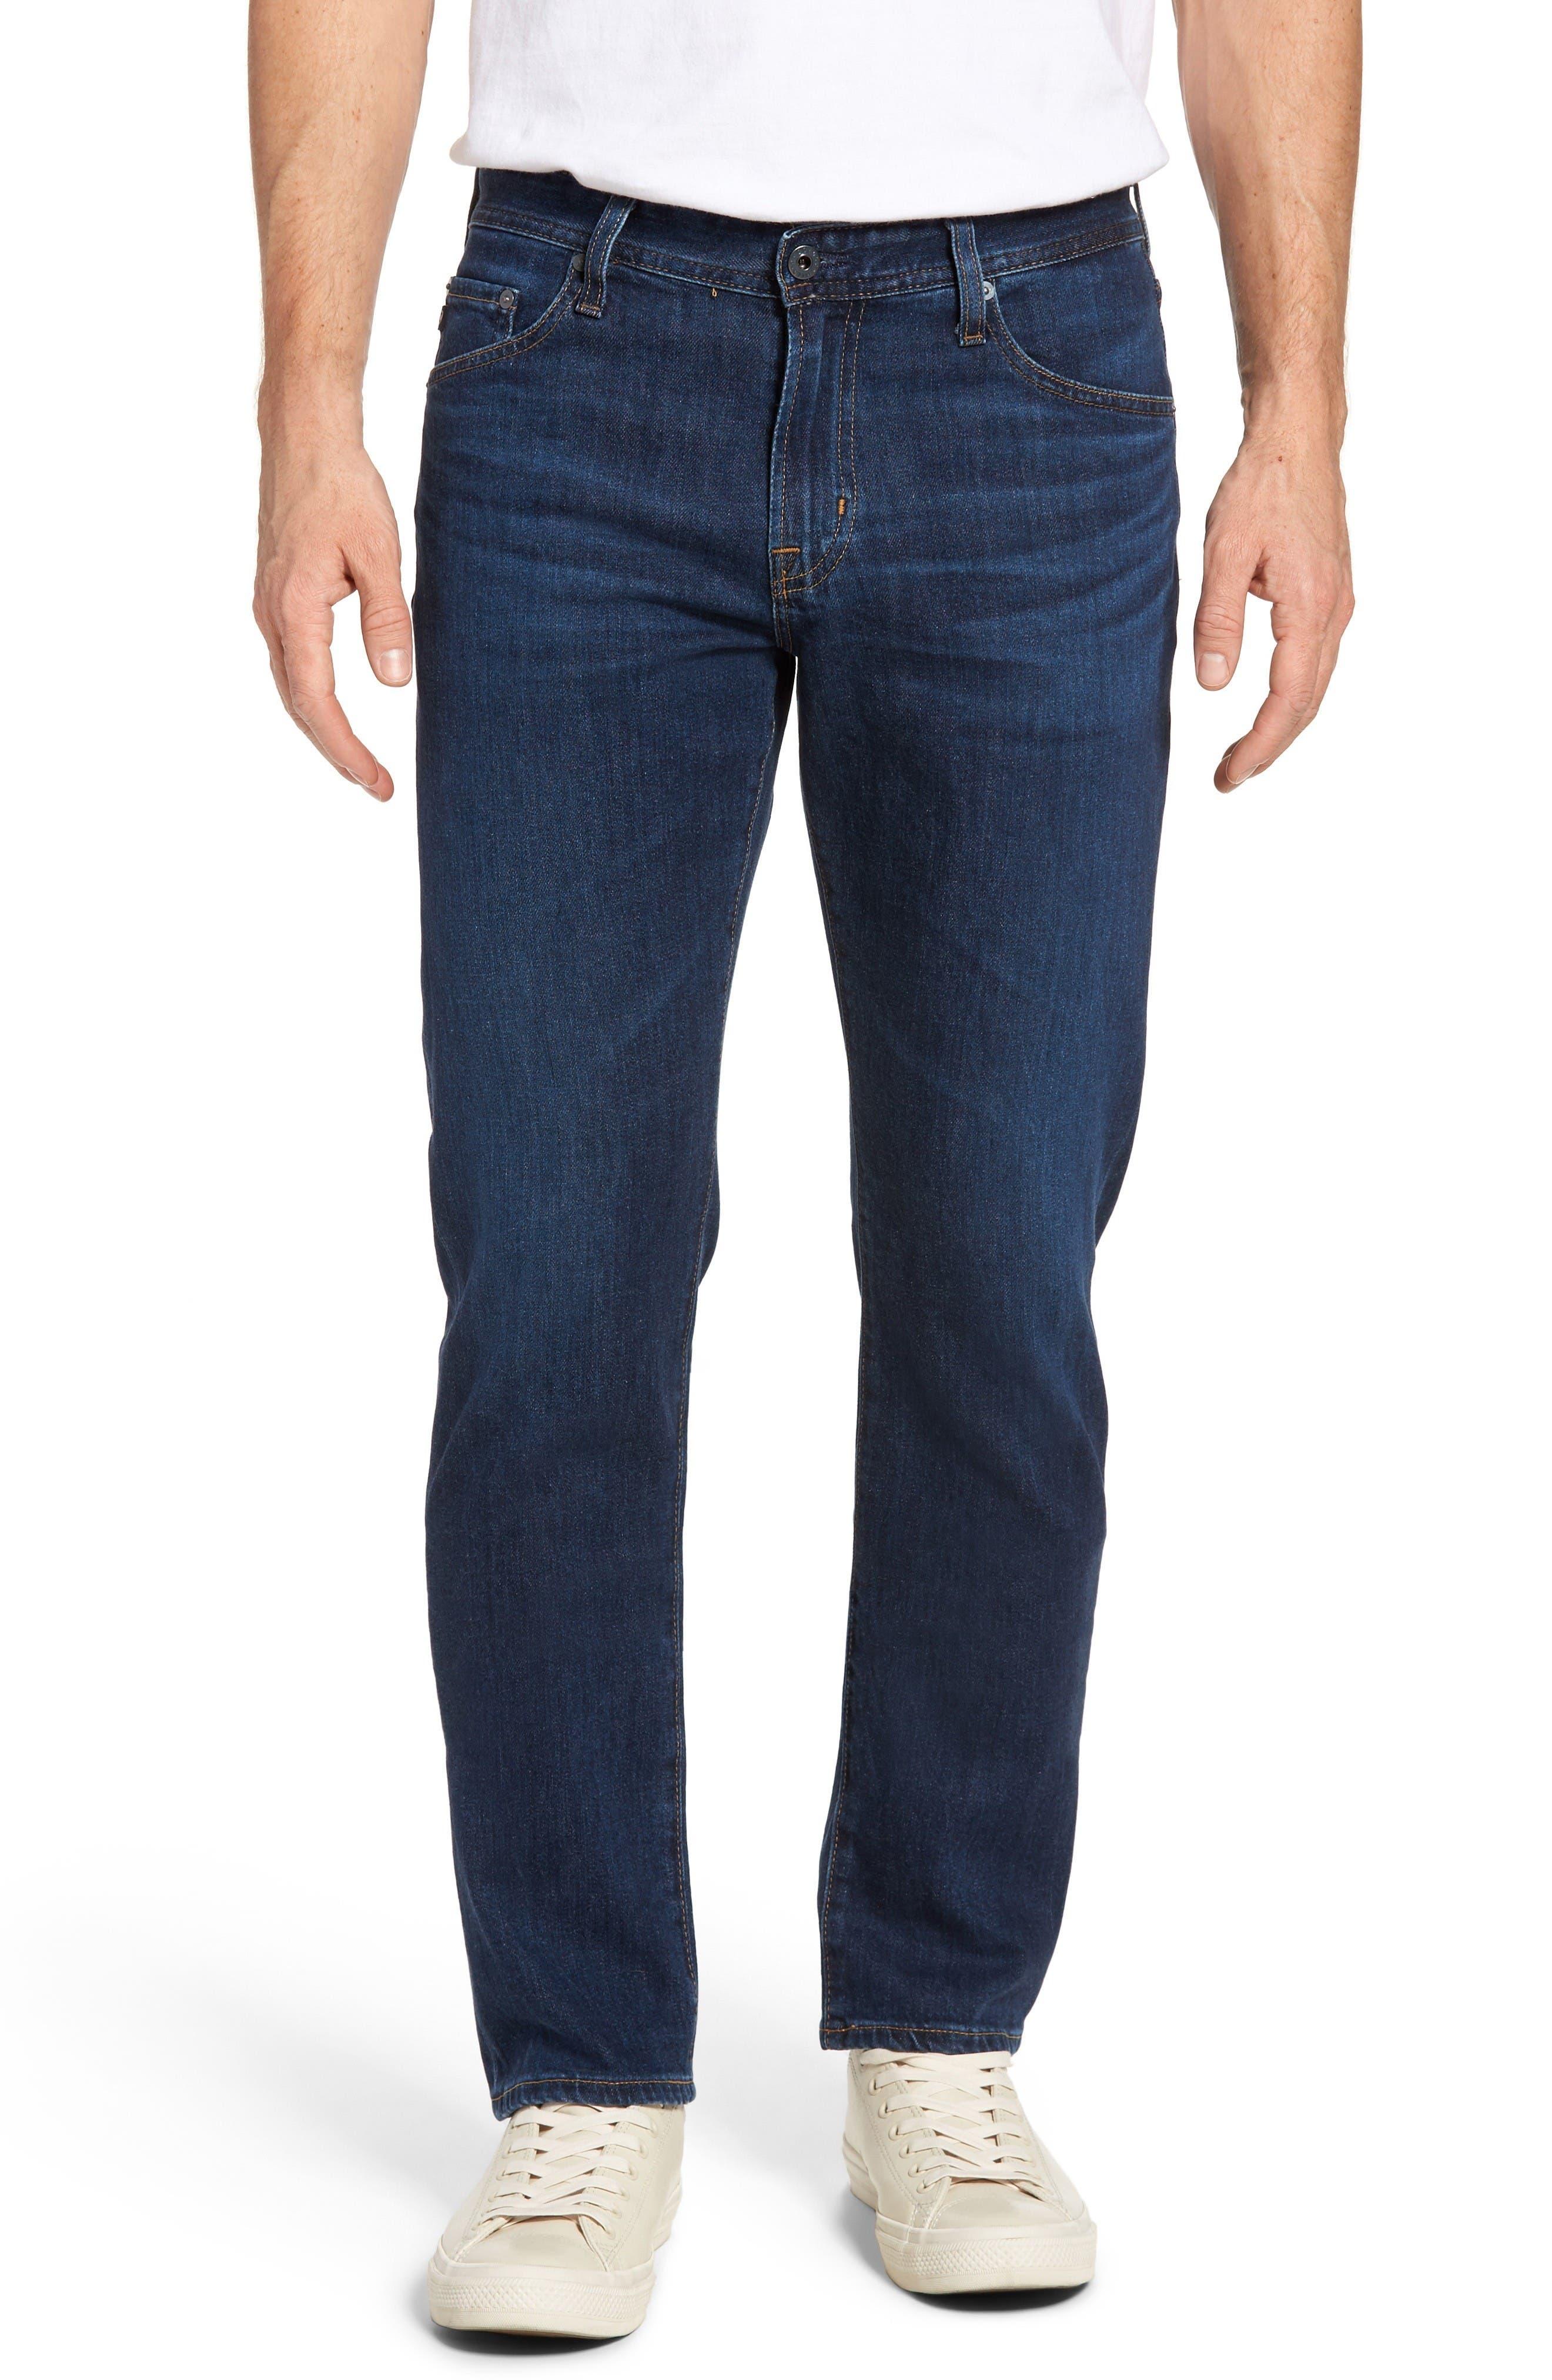 Graduate Slim Straight Leg Jeans,                         Main,                         color, Courts